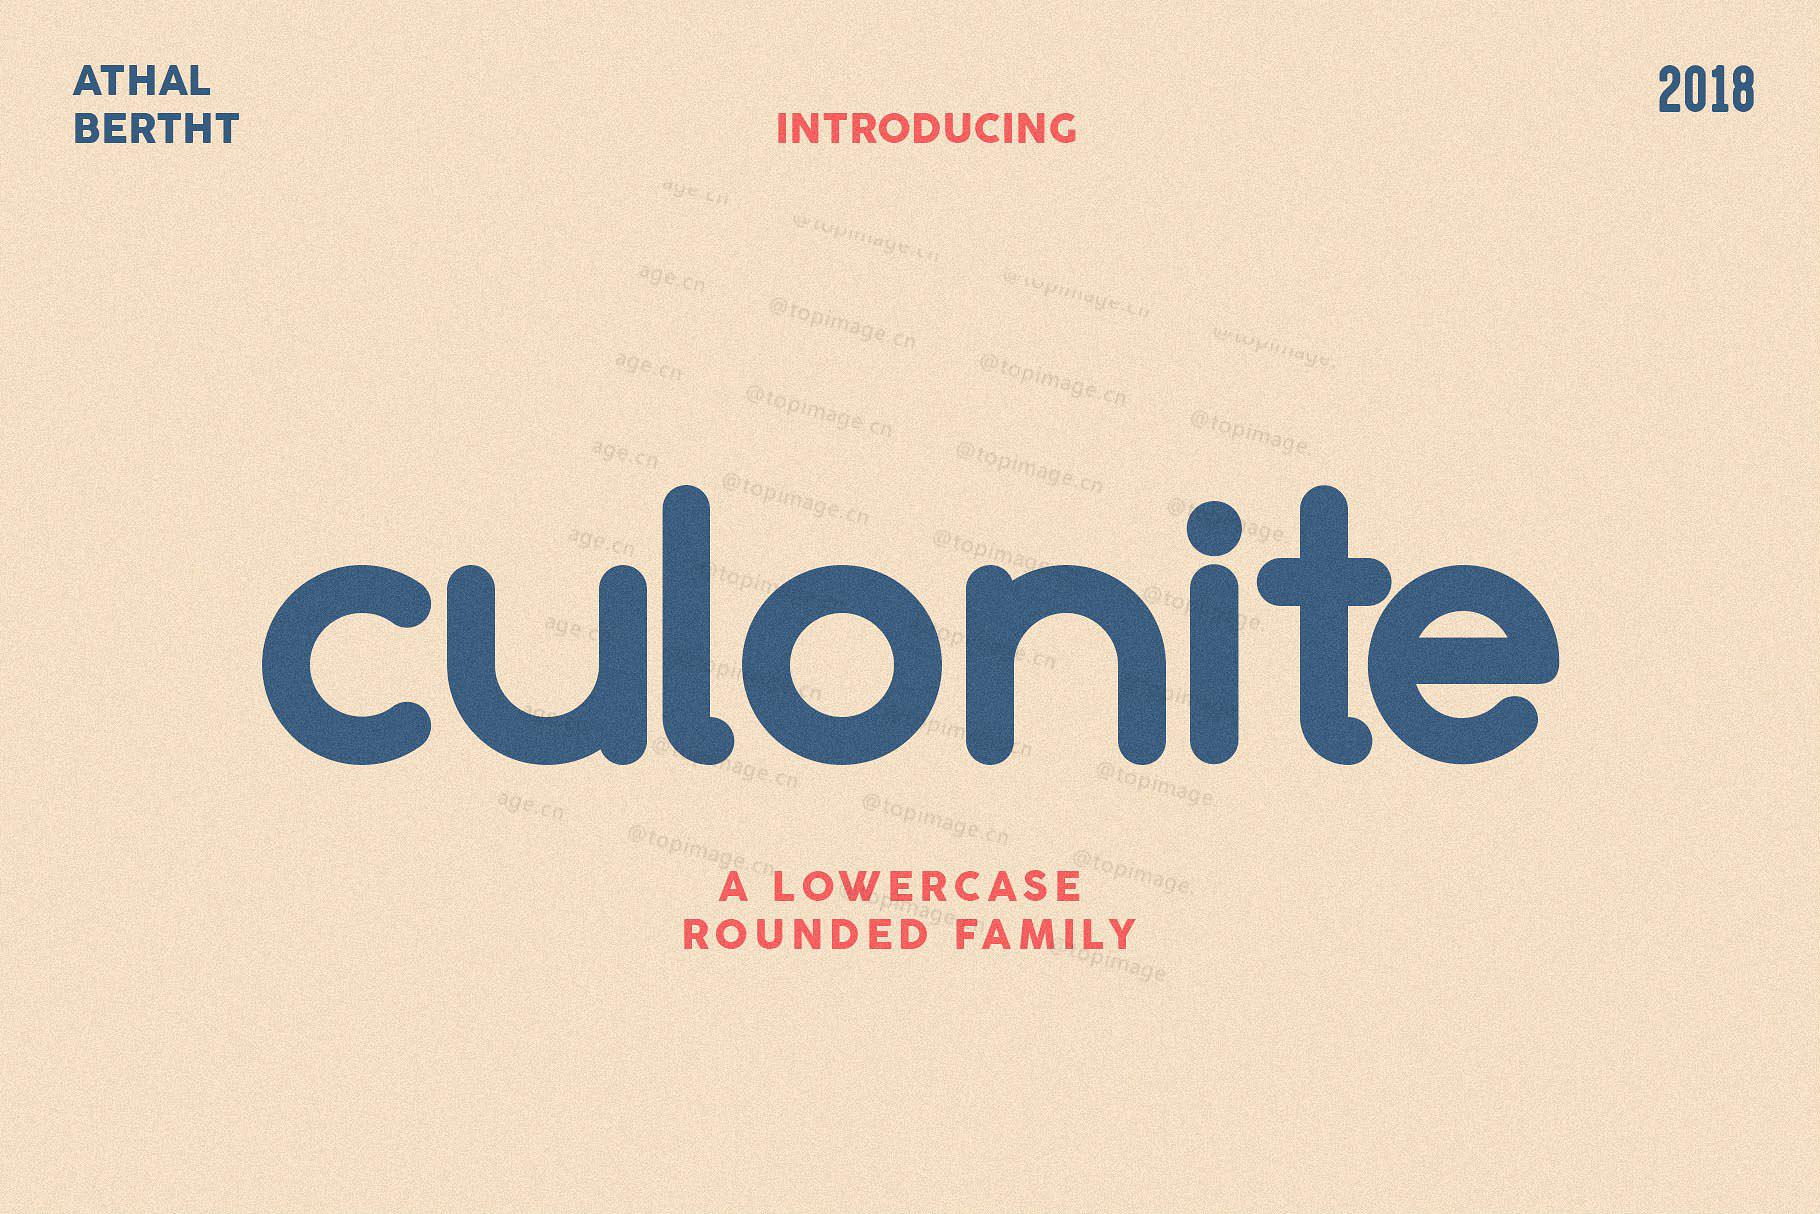 Culonite圆润现代简洁logo 英文字体下载